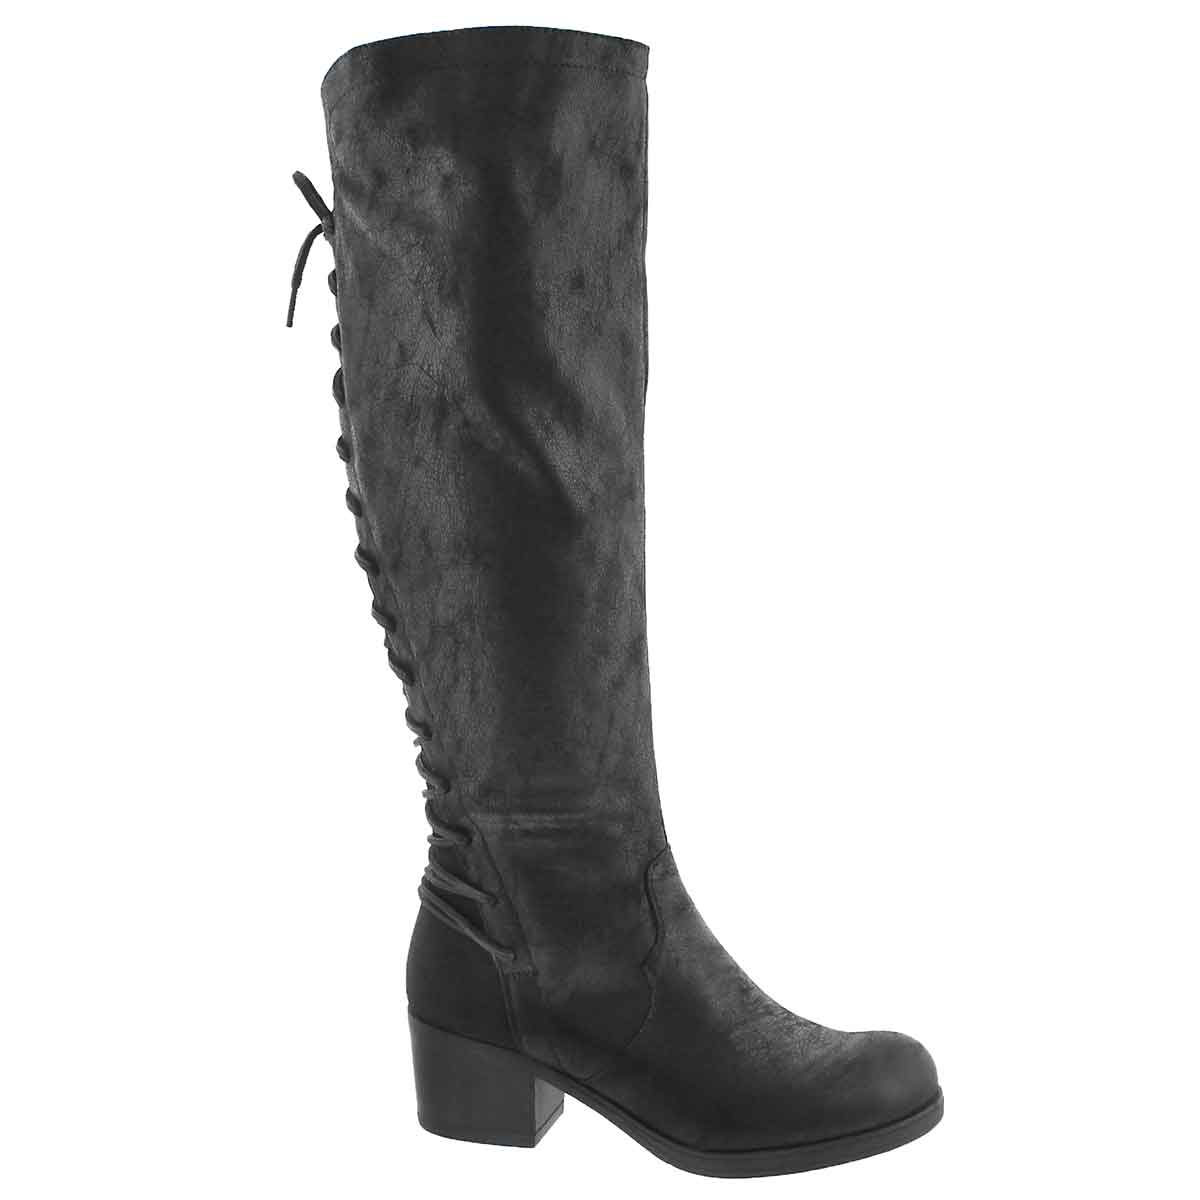 Women's BRETTE black knee high dress boots